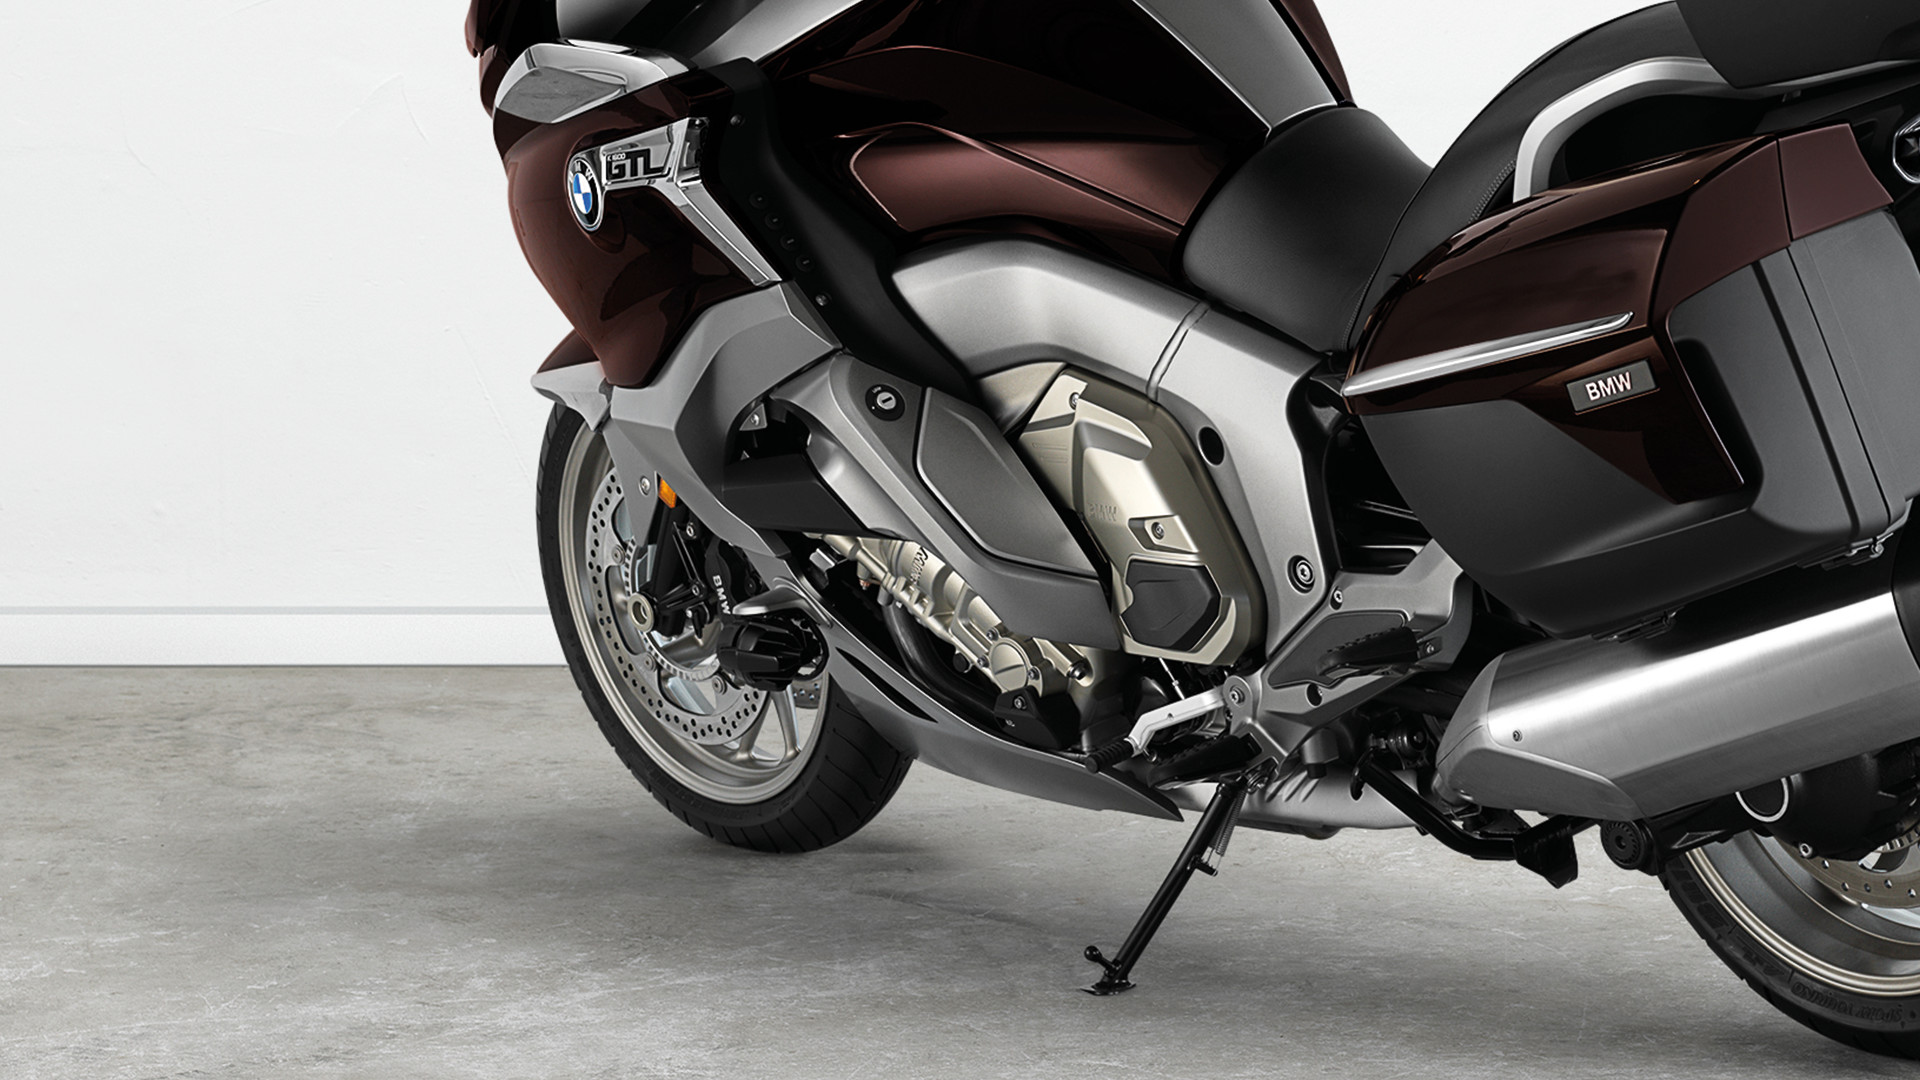 K 1600 GTL   BMW Motorcycles of Riverside California